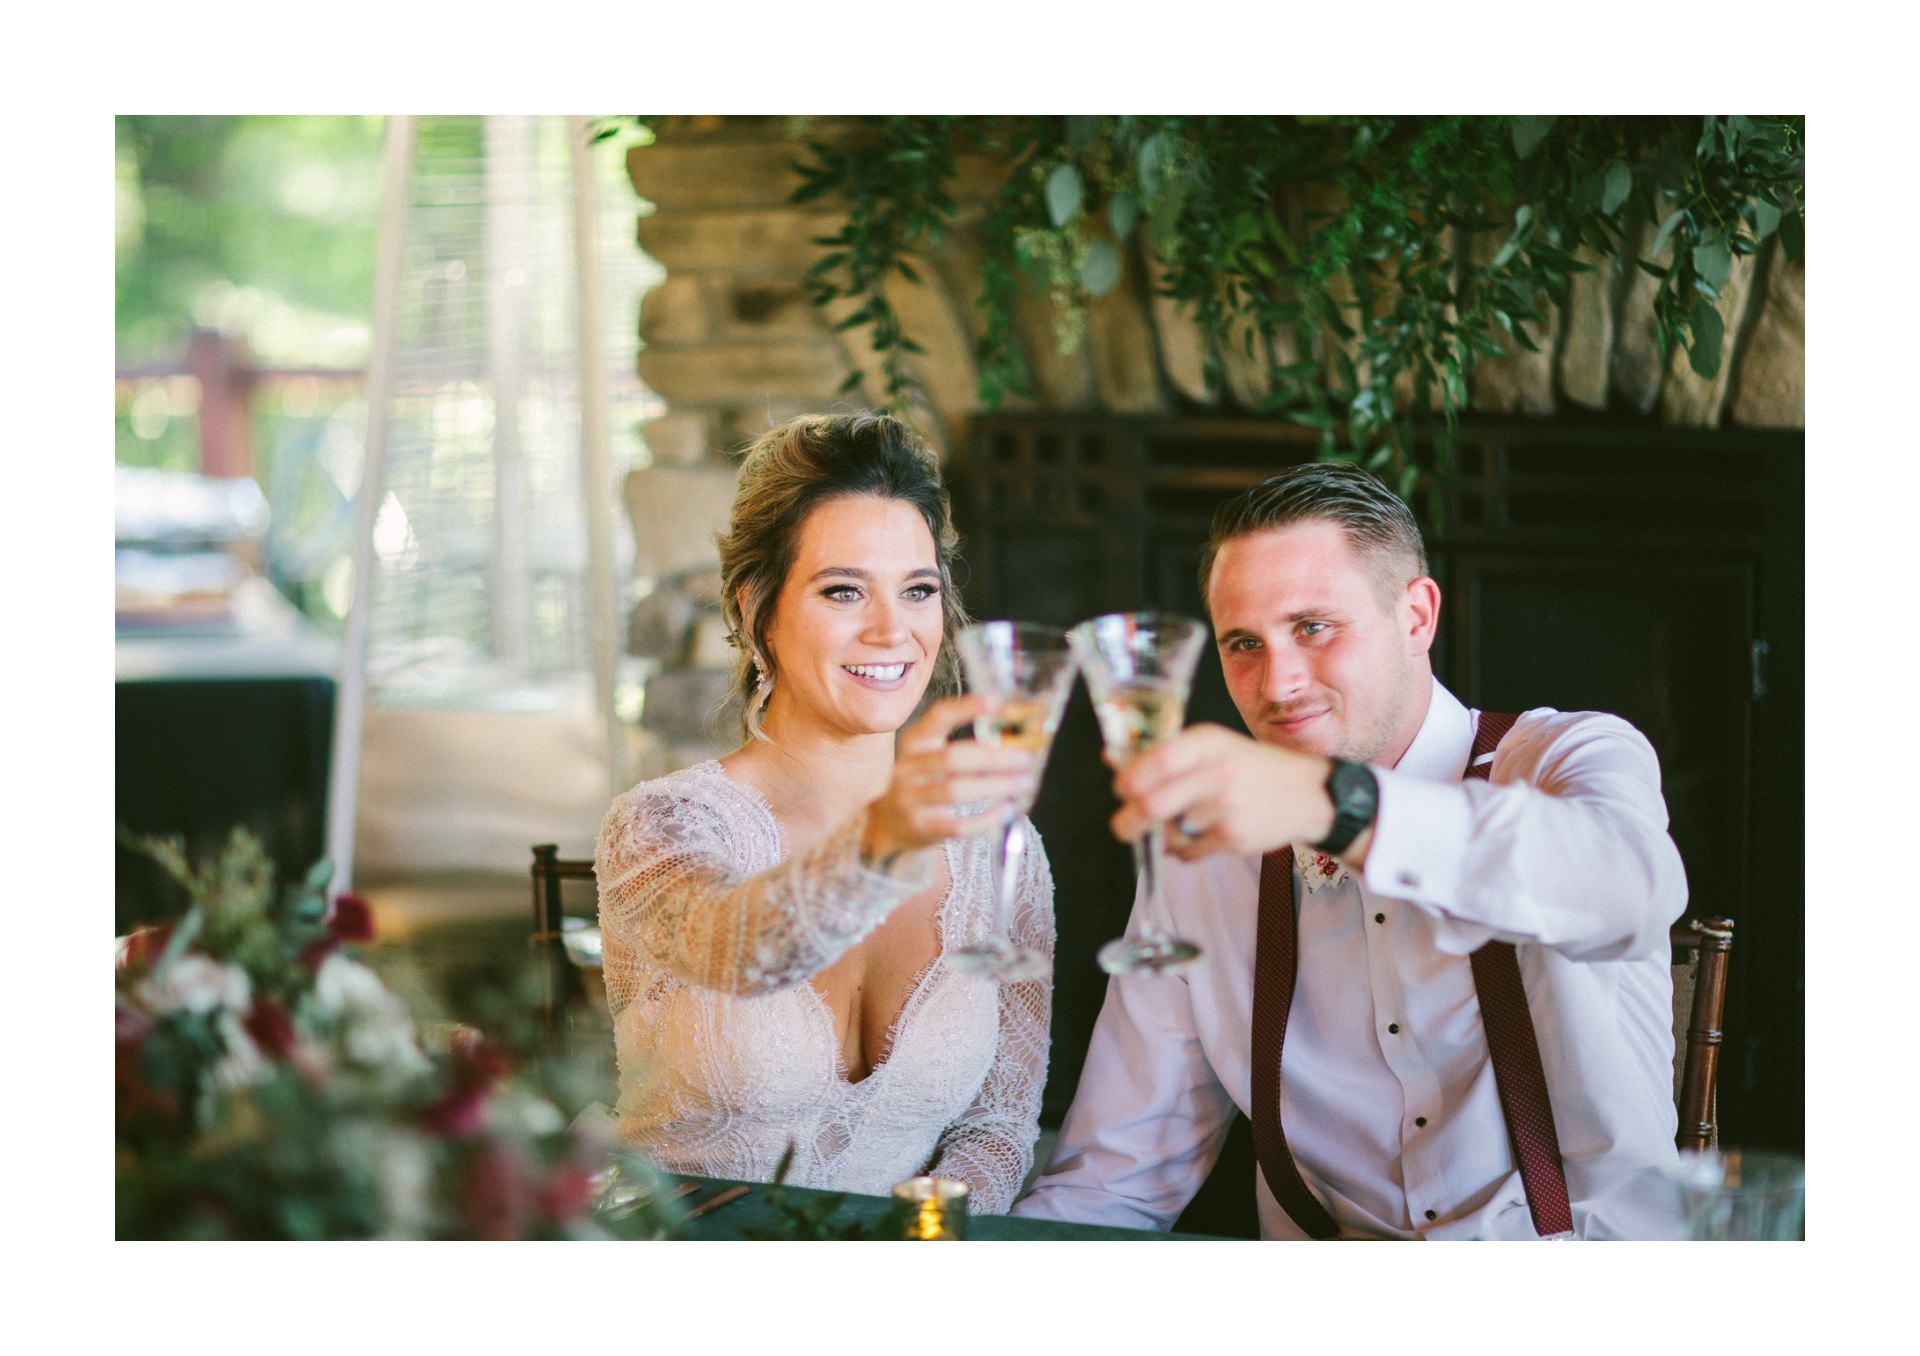 Meadow Ridge Farm Wedding Photos in Windsor 3 13.jpg